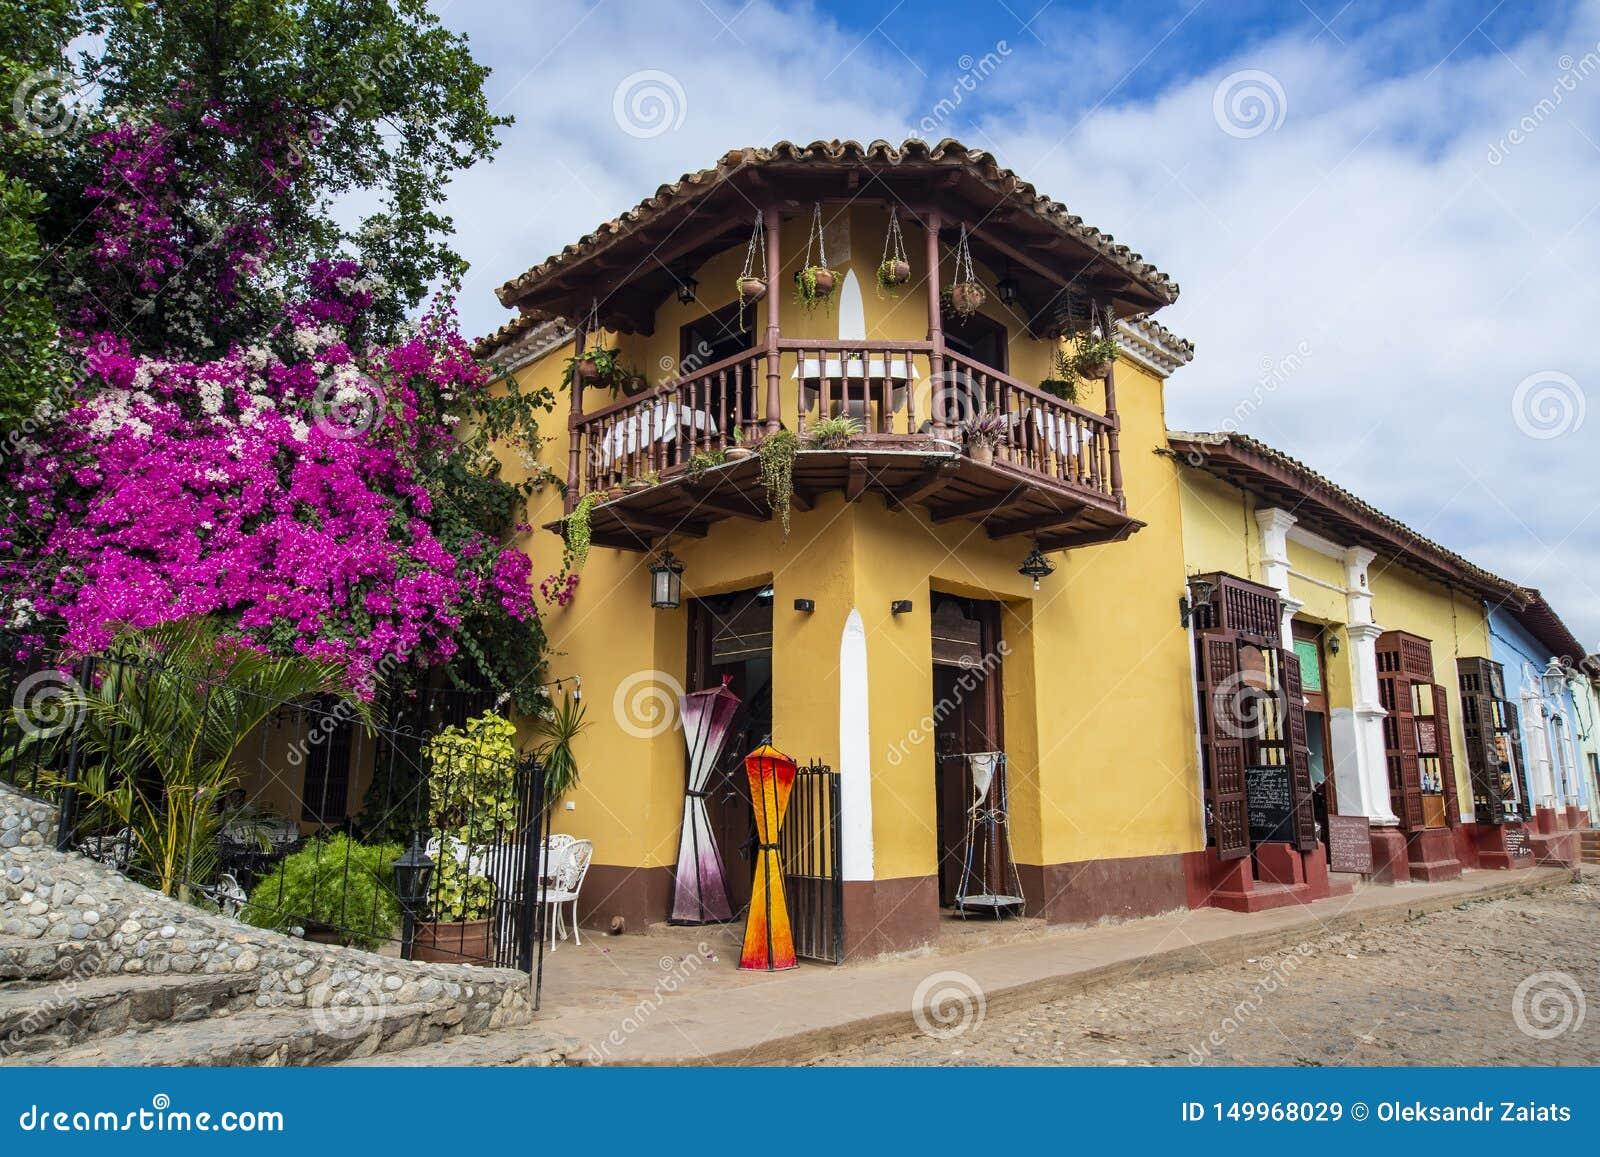 Cuba Trinidad Hoek van oud twee vloer de bouwrestaurant met violette en purpere bloemen Mooie hemel met wolken